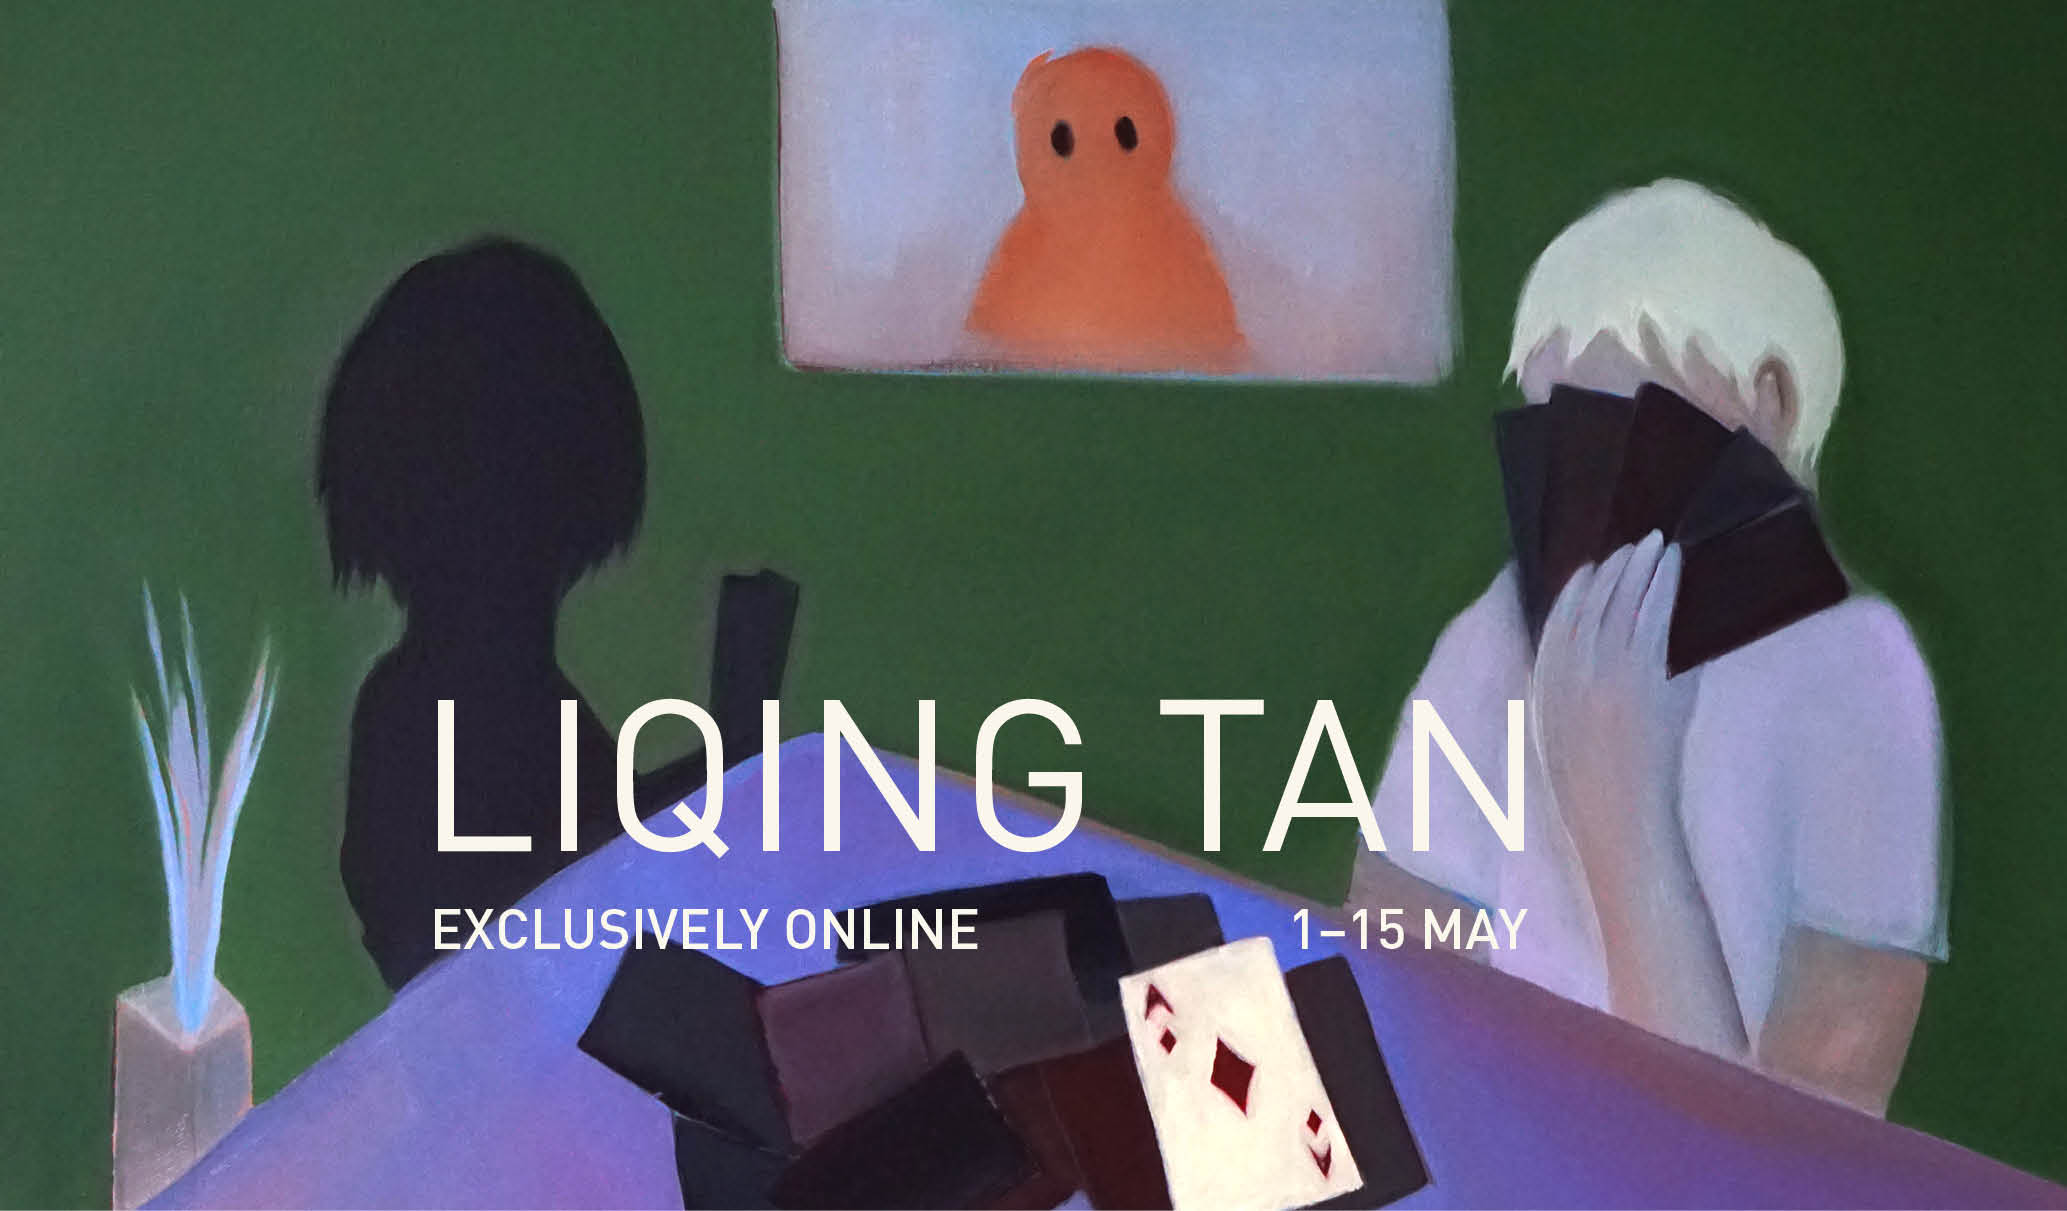 liqing tan artist andelli art